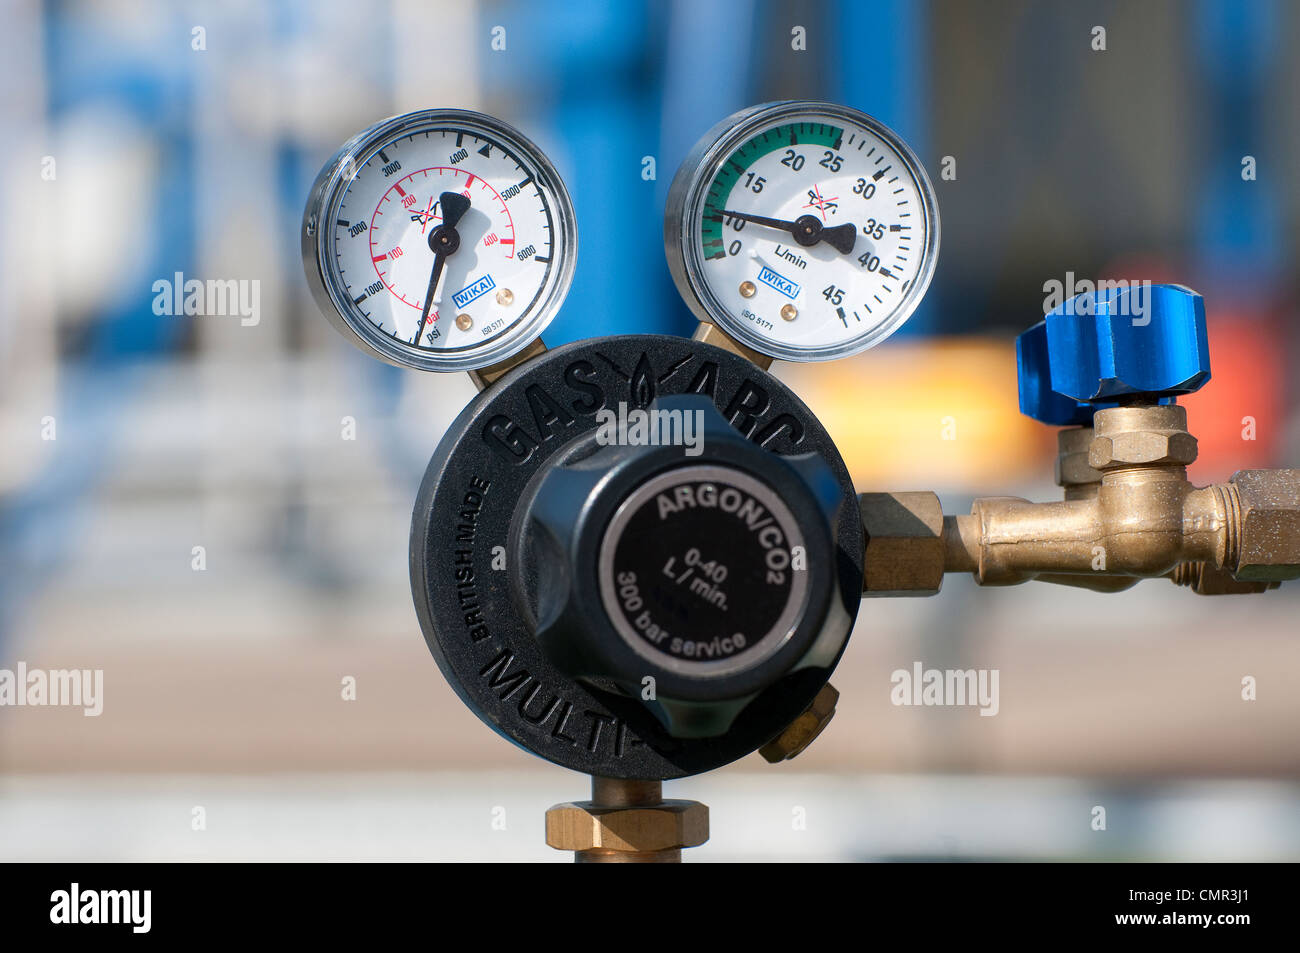 industrial chemical plant, argon co2 gas regulator pressure valves - Stock Image